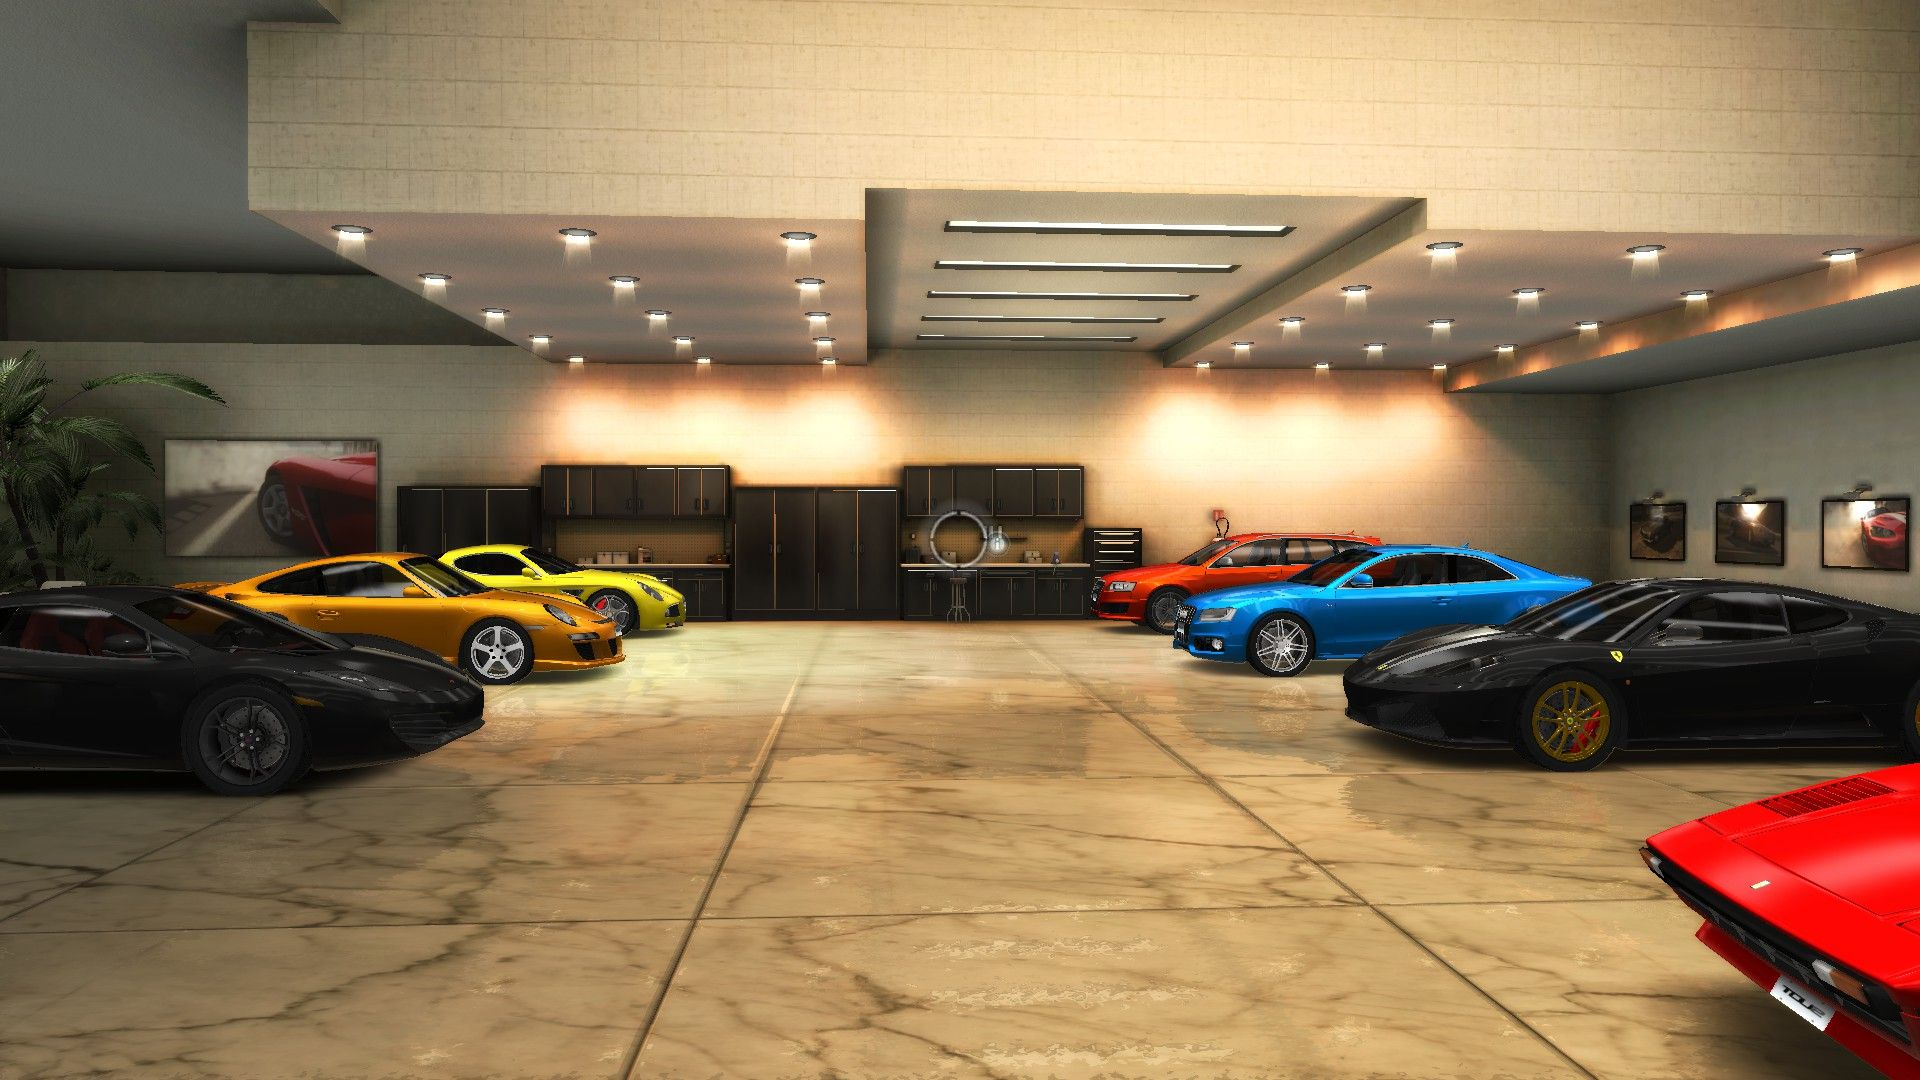 Collectors garage dream home pinterest remolques de for Garajes de ensueno